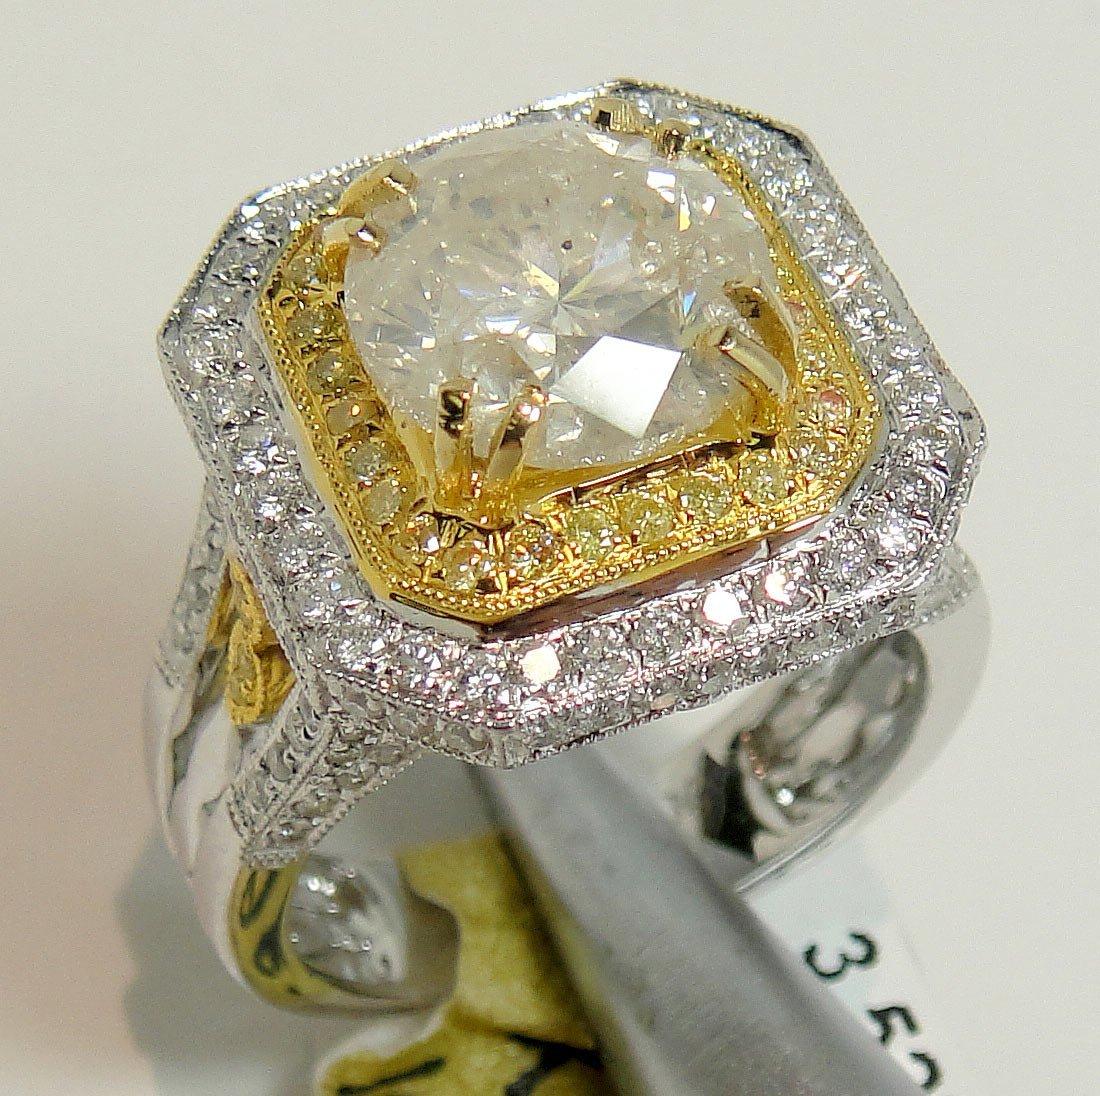 4.69ctw (3.52ct I2 K CNTR) Diamond 18KT Gold Ring AIG